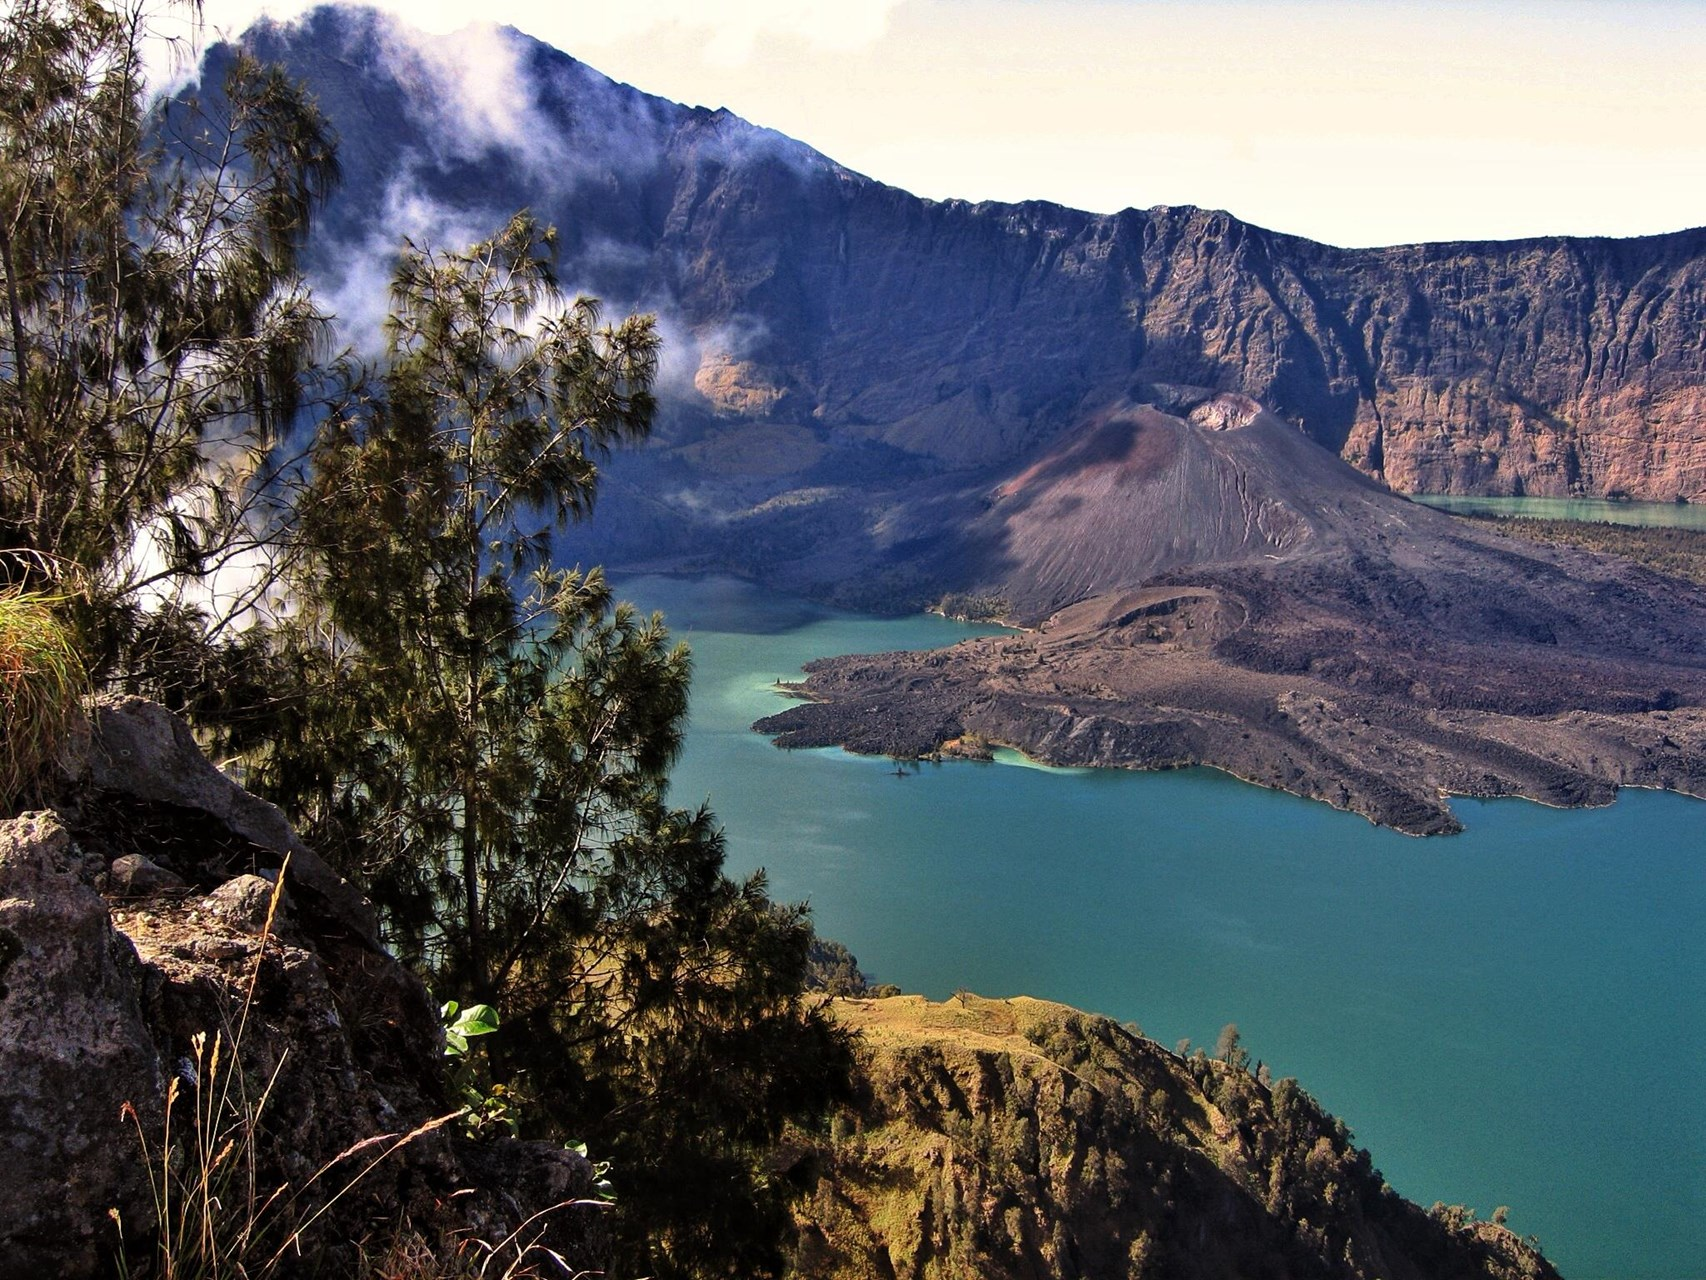 Climb Mount Rinjani